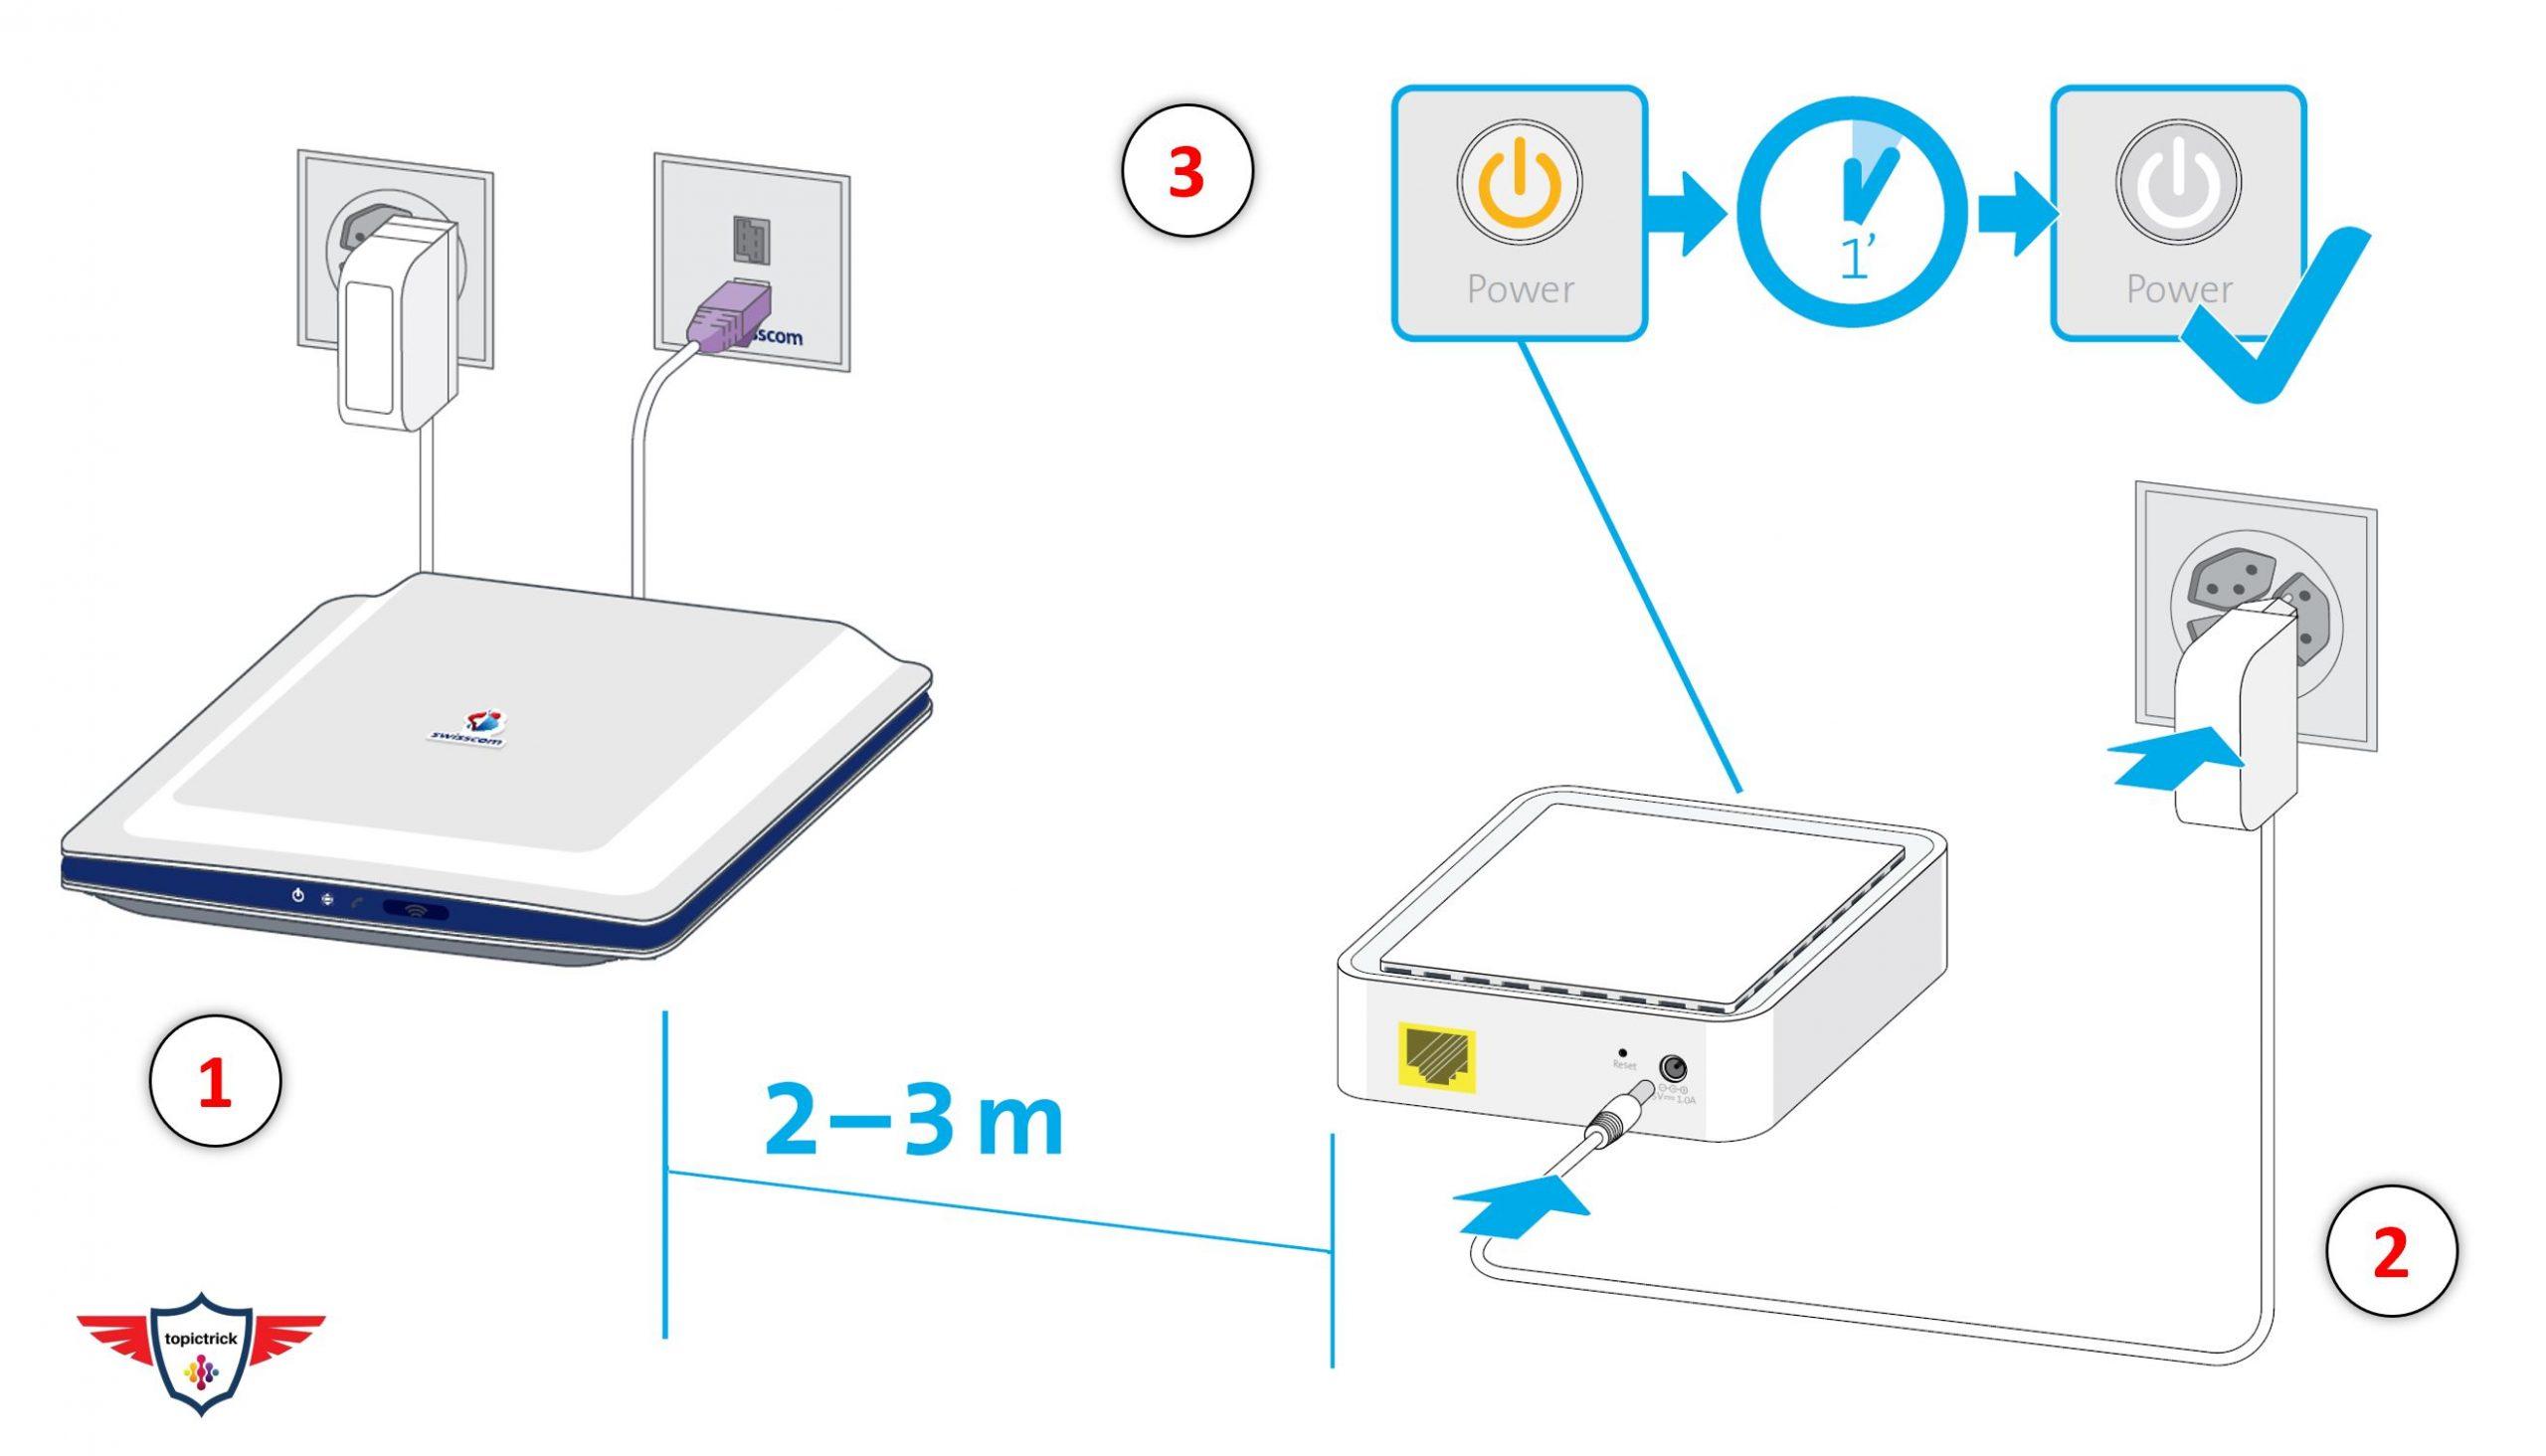 6 Easy steps to setup Swisscom Wifi Repeater. WLAN Repeater setup explained!